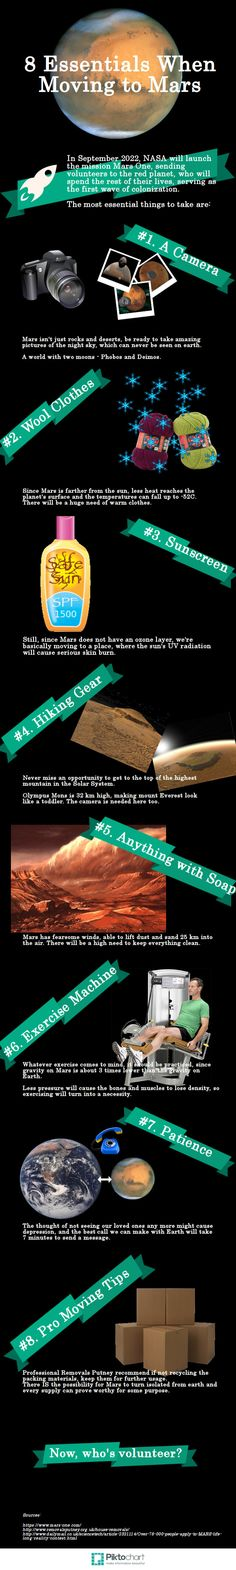 104 Best Mars Colonization images | Mars, Space ...